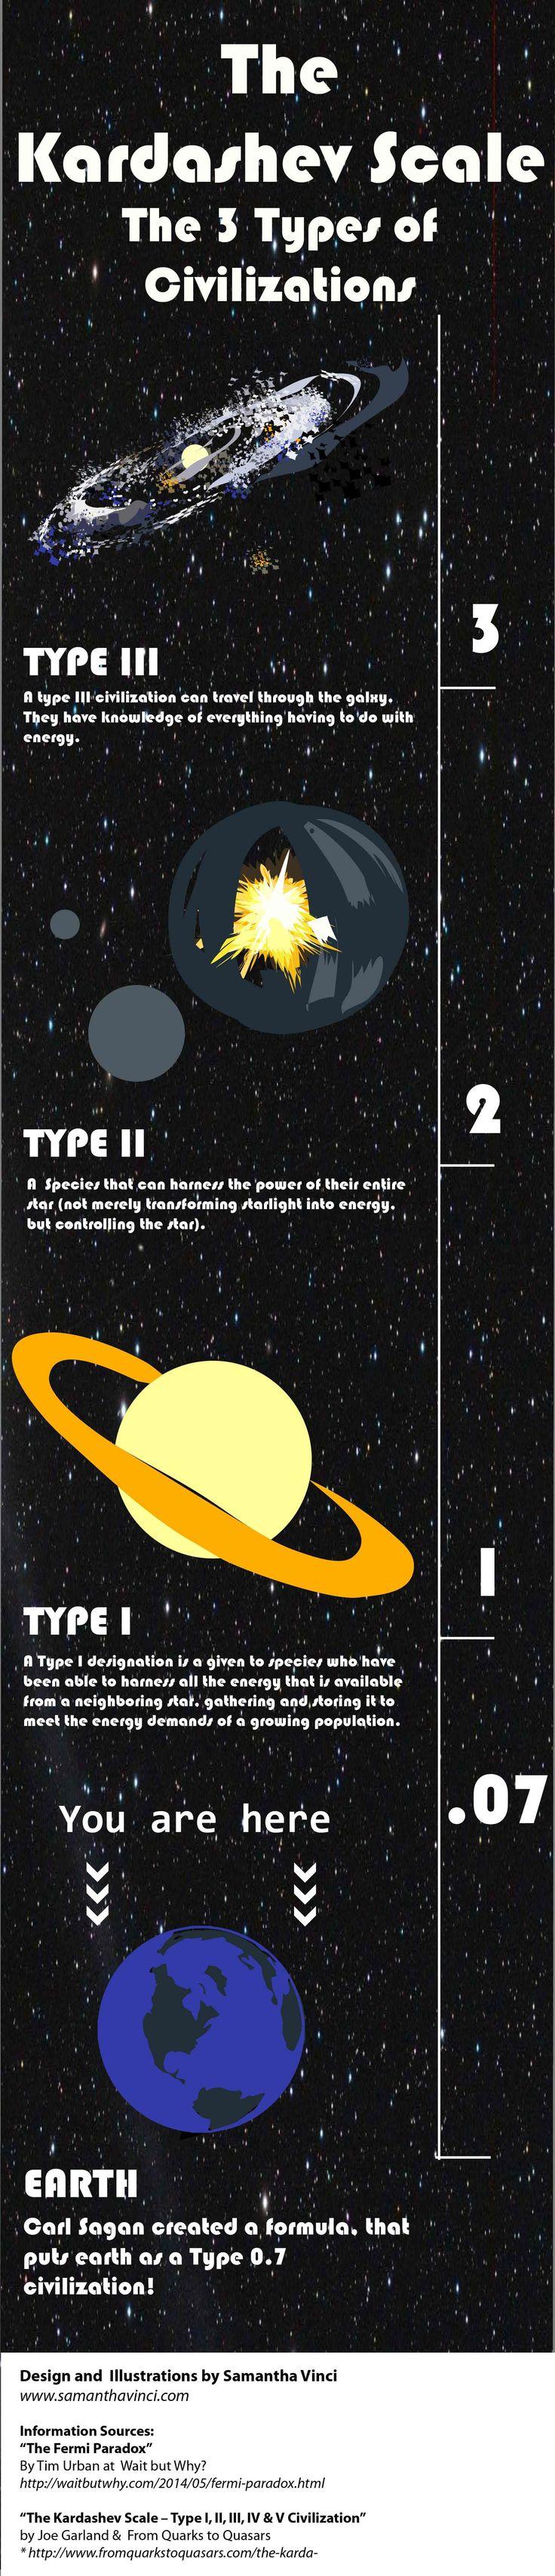 kardashev scale- 3 types of alien civilization